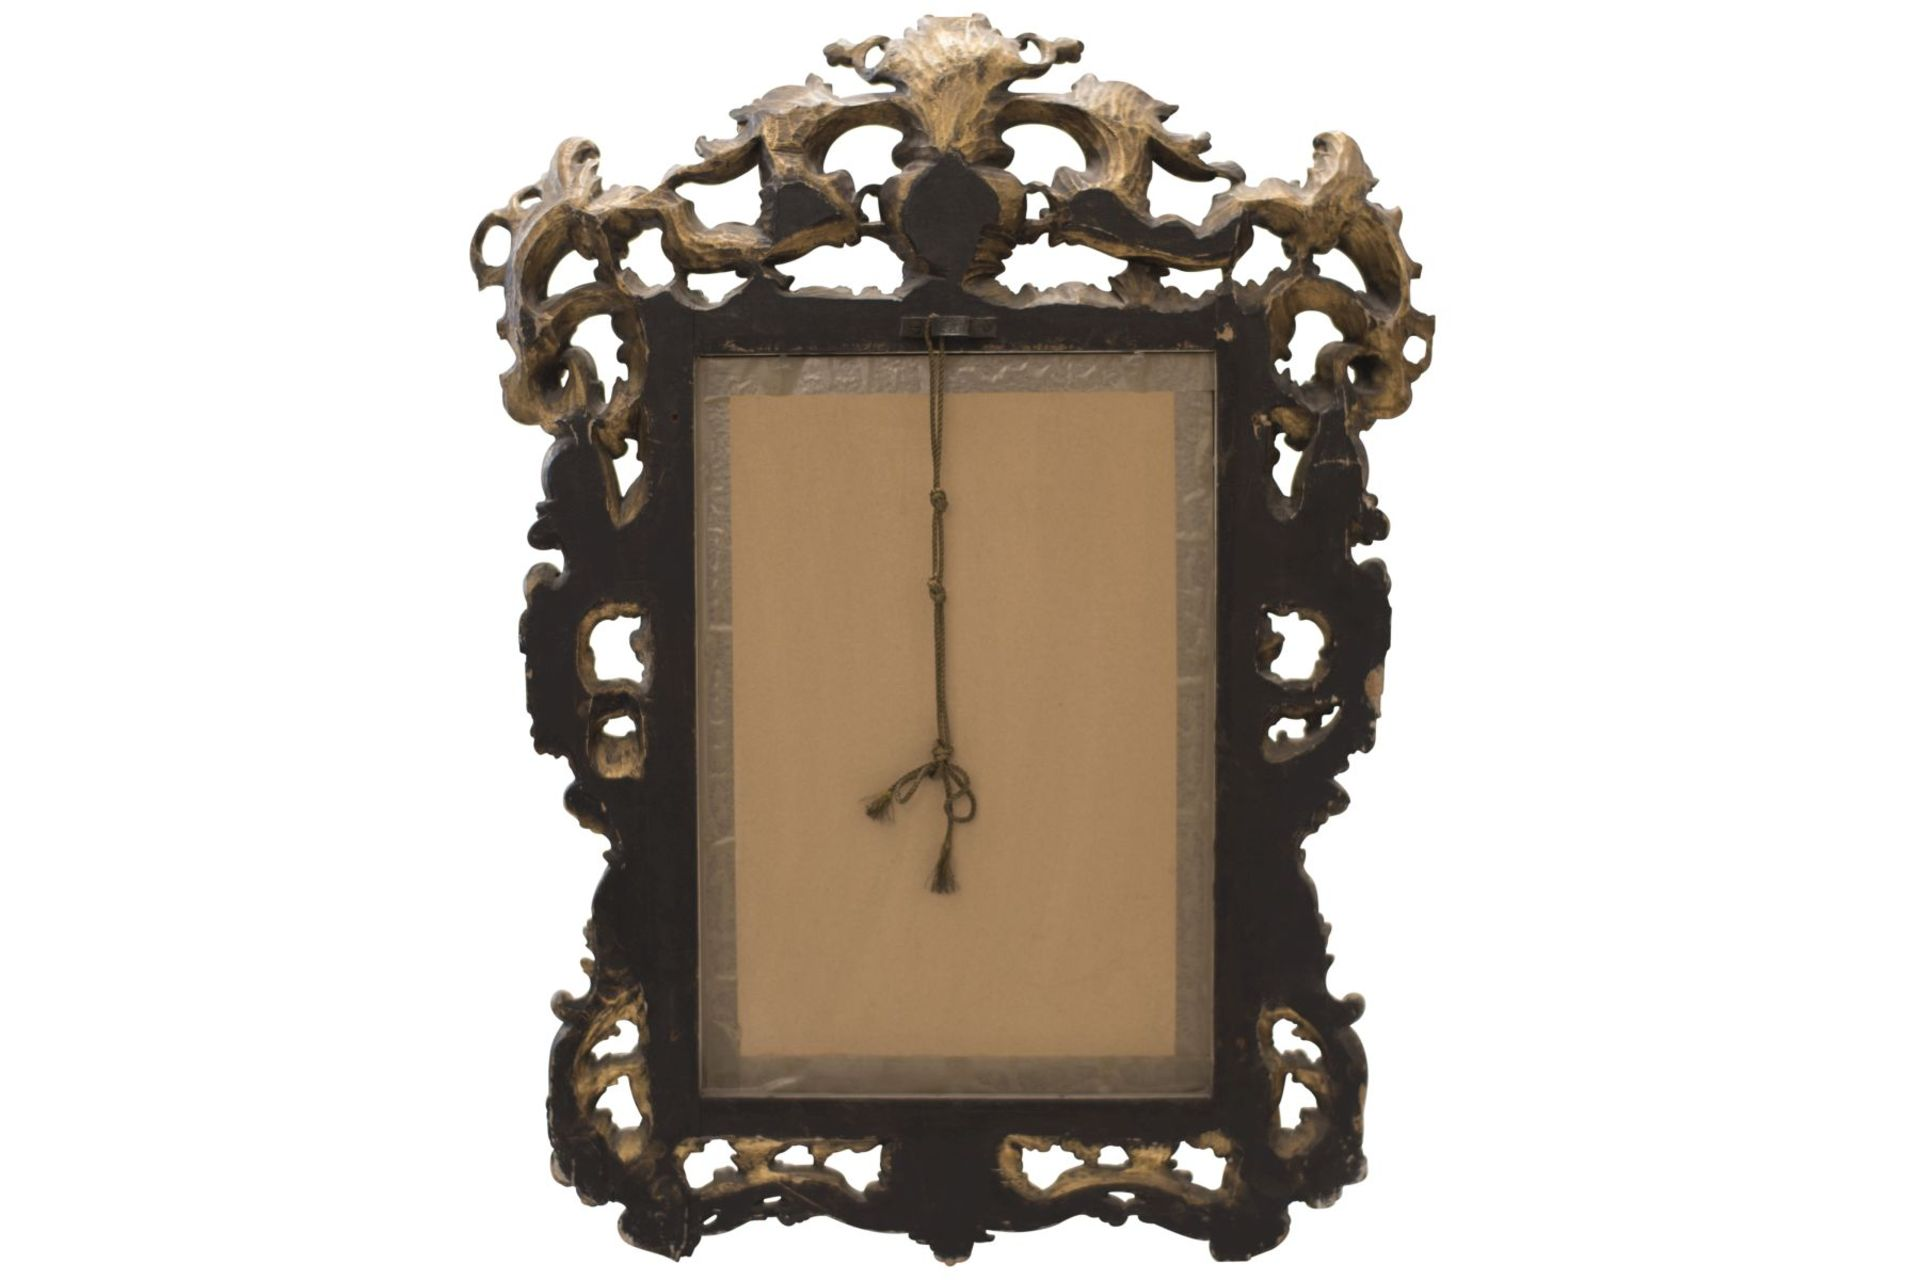 Baroque style salon mirror, 19th century - Image 6 of 6